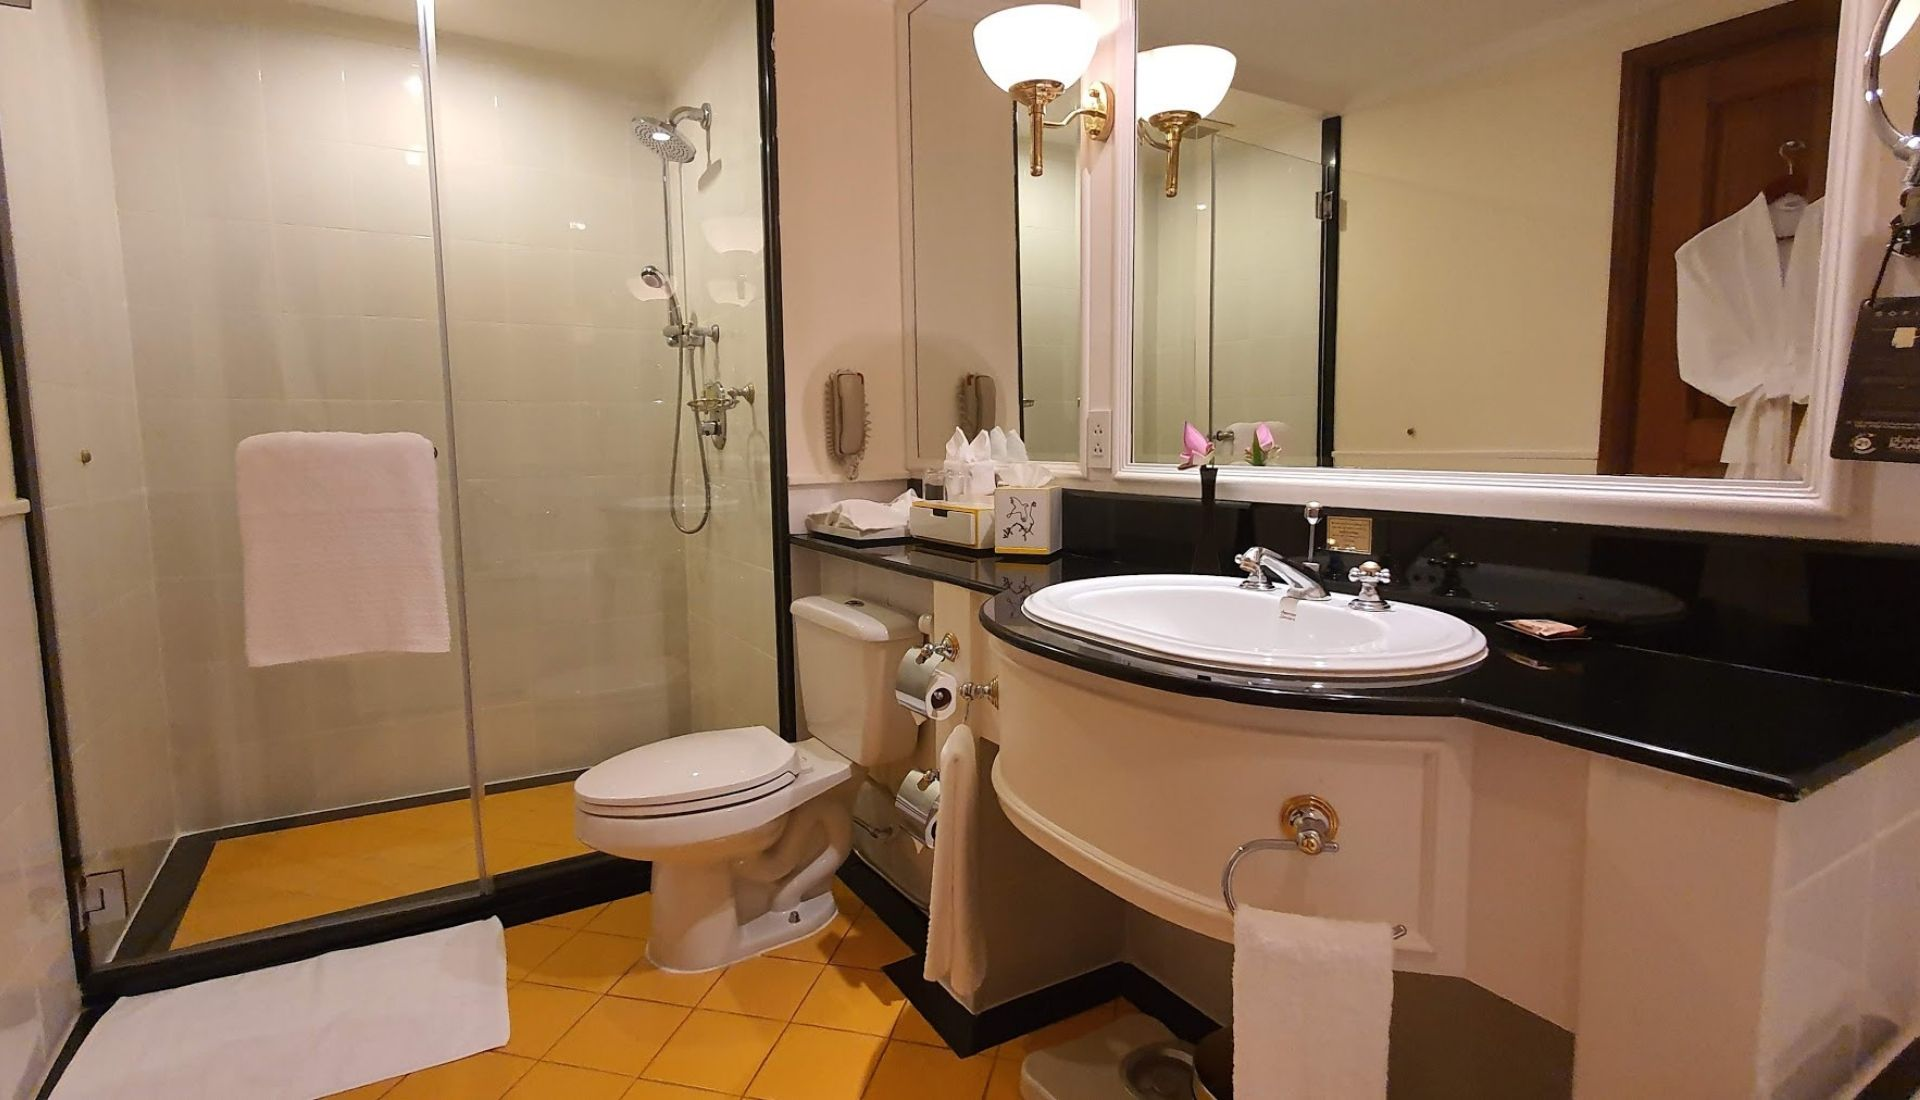 Generous sized bathrooms at the Sofitel Siem Reap